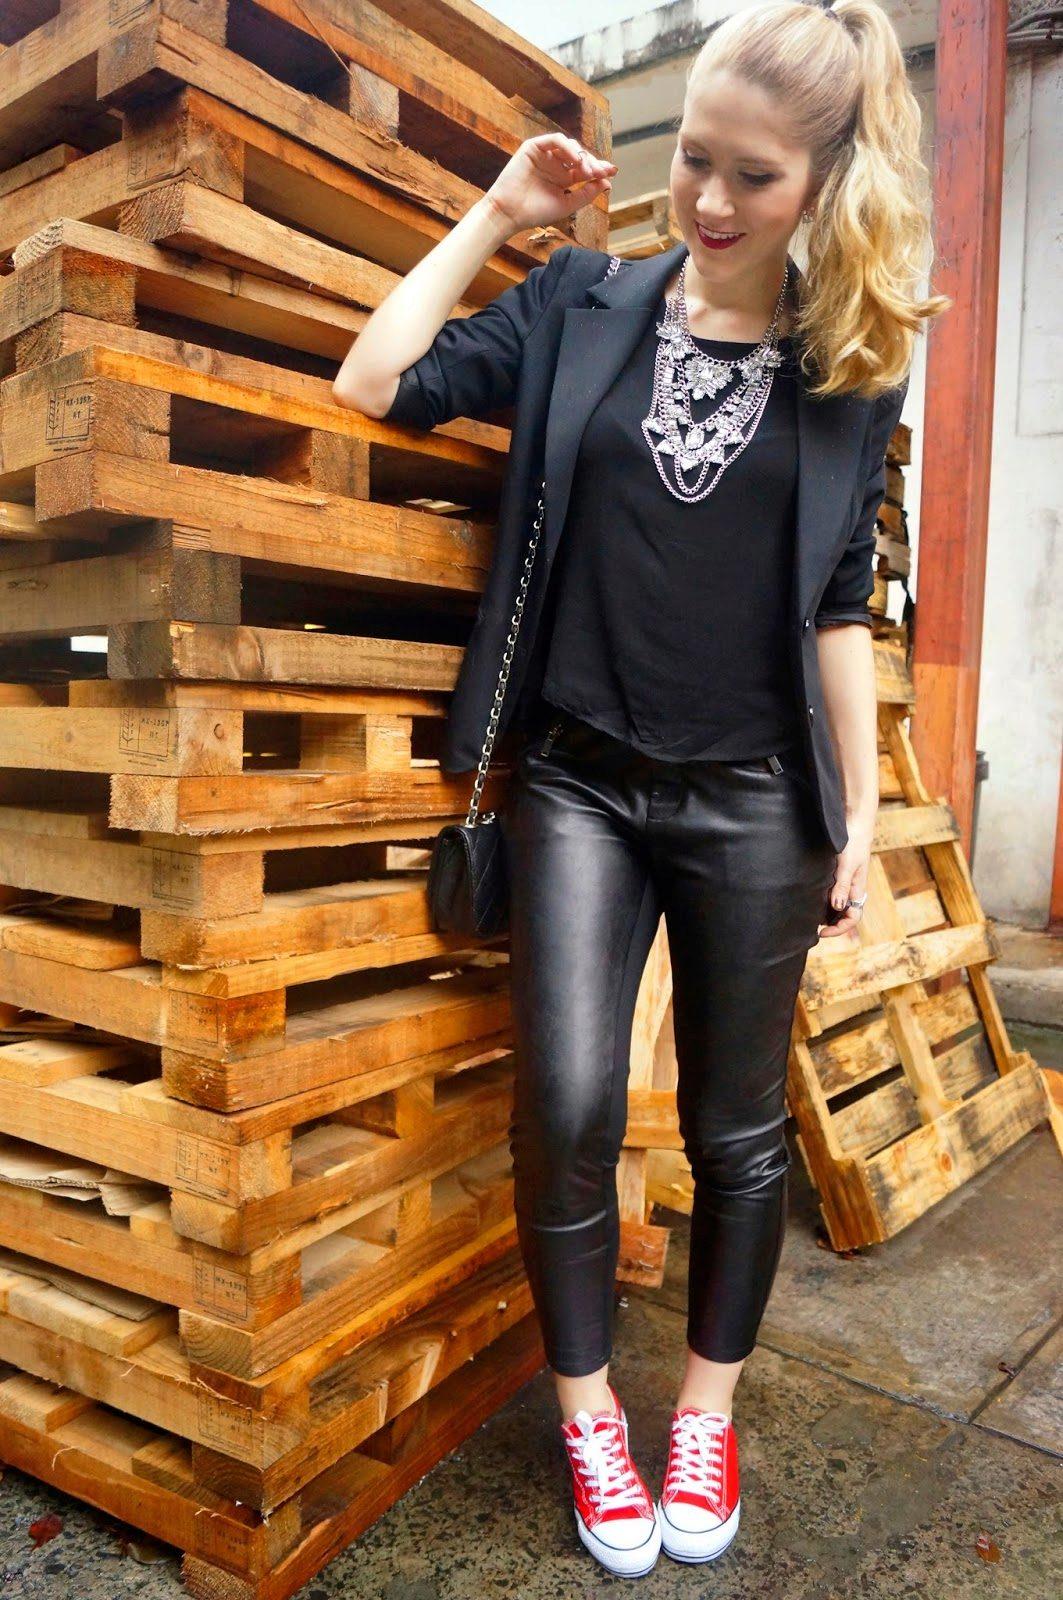 Leather Jacket - Get genuine leather